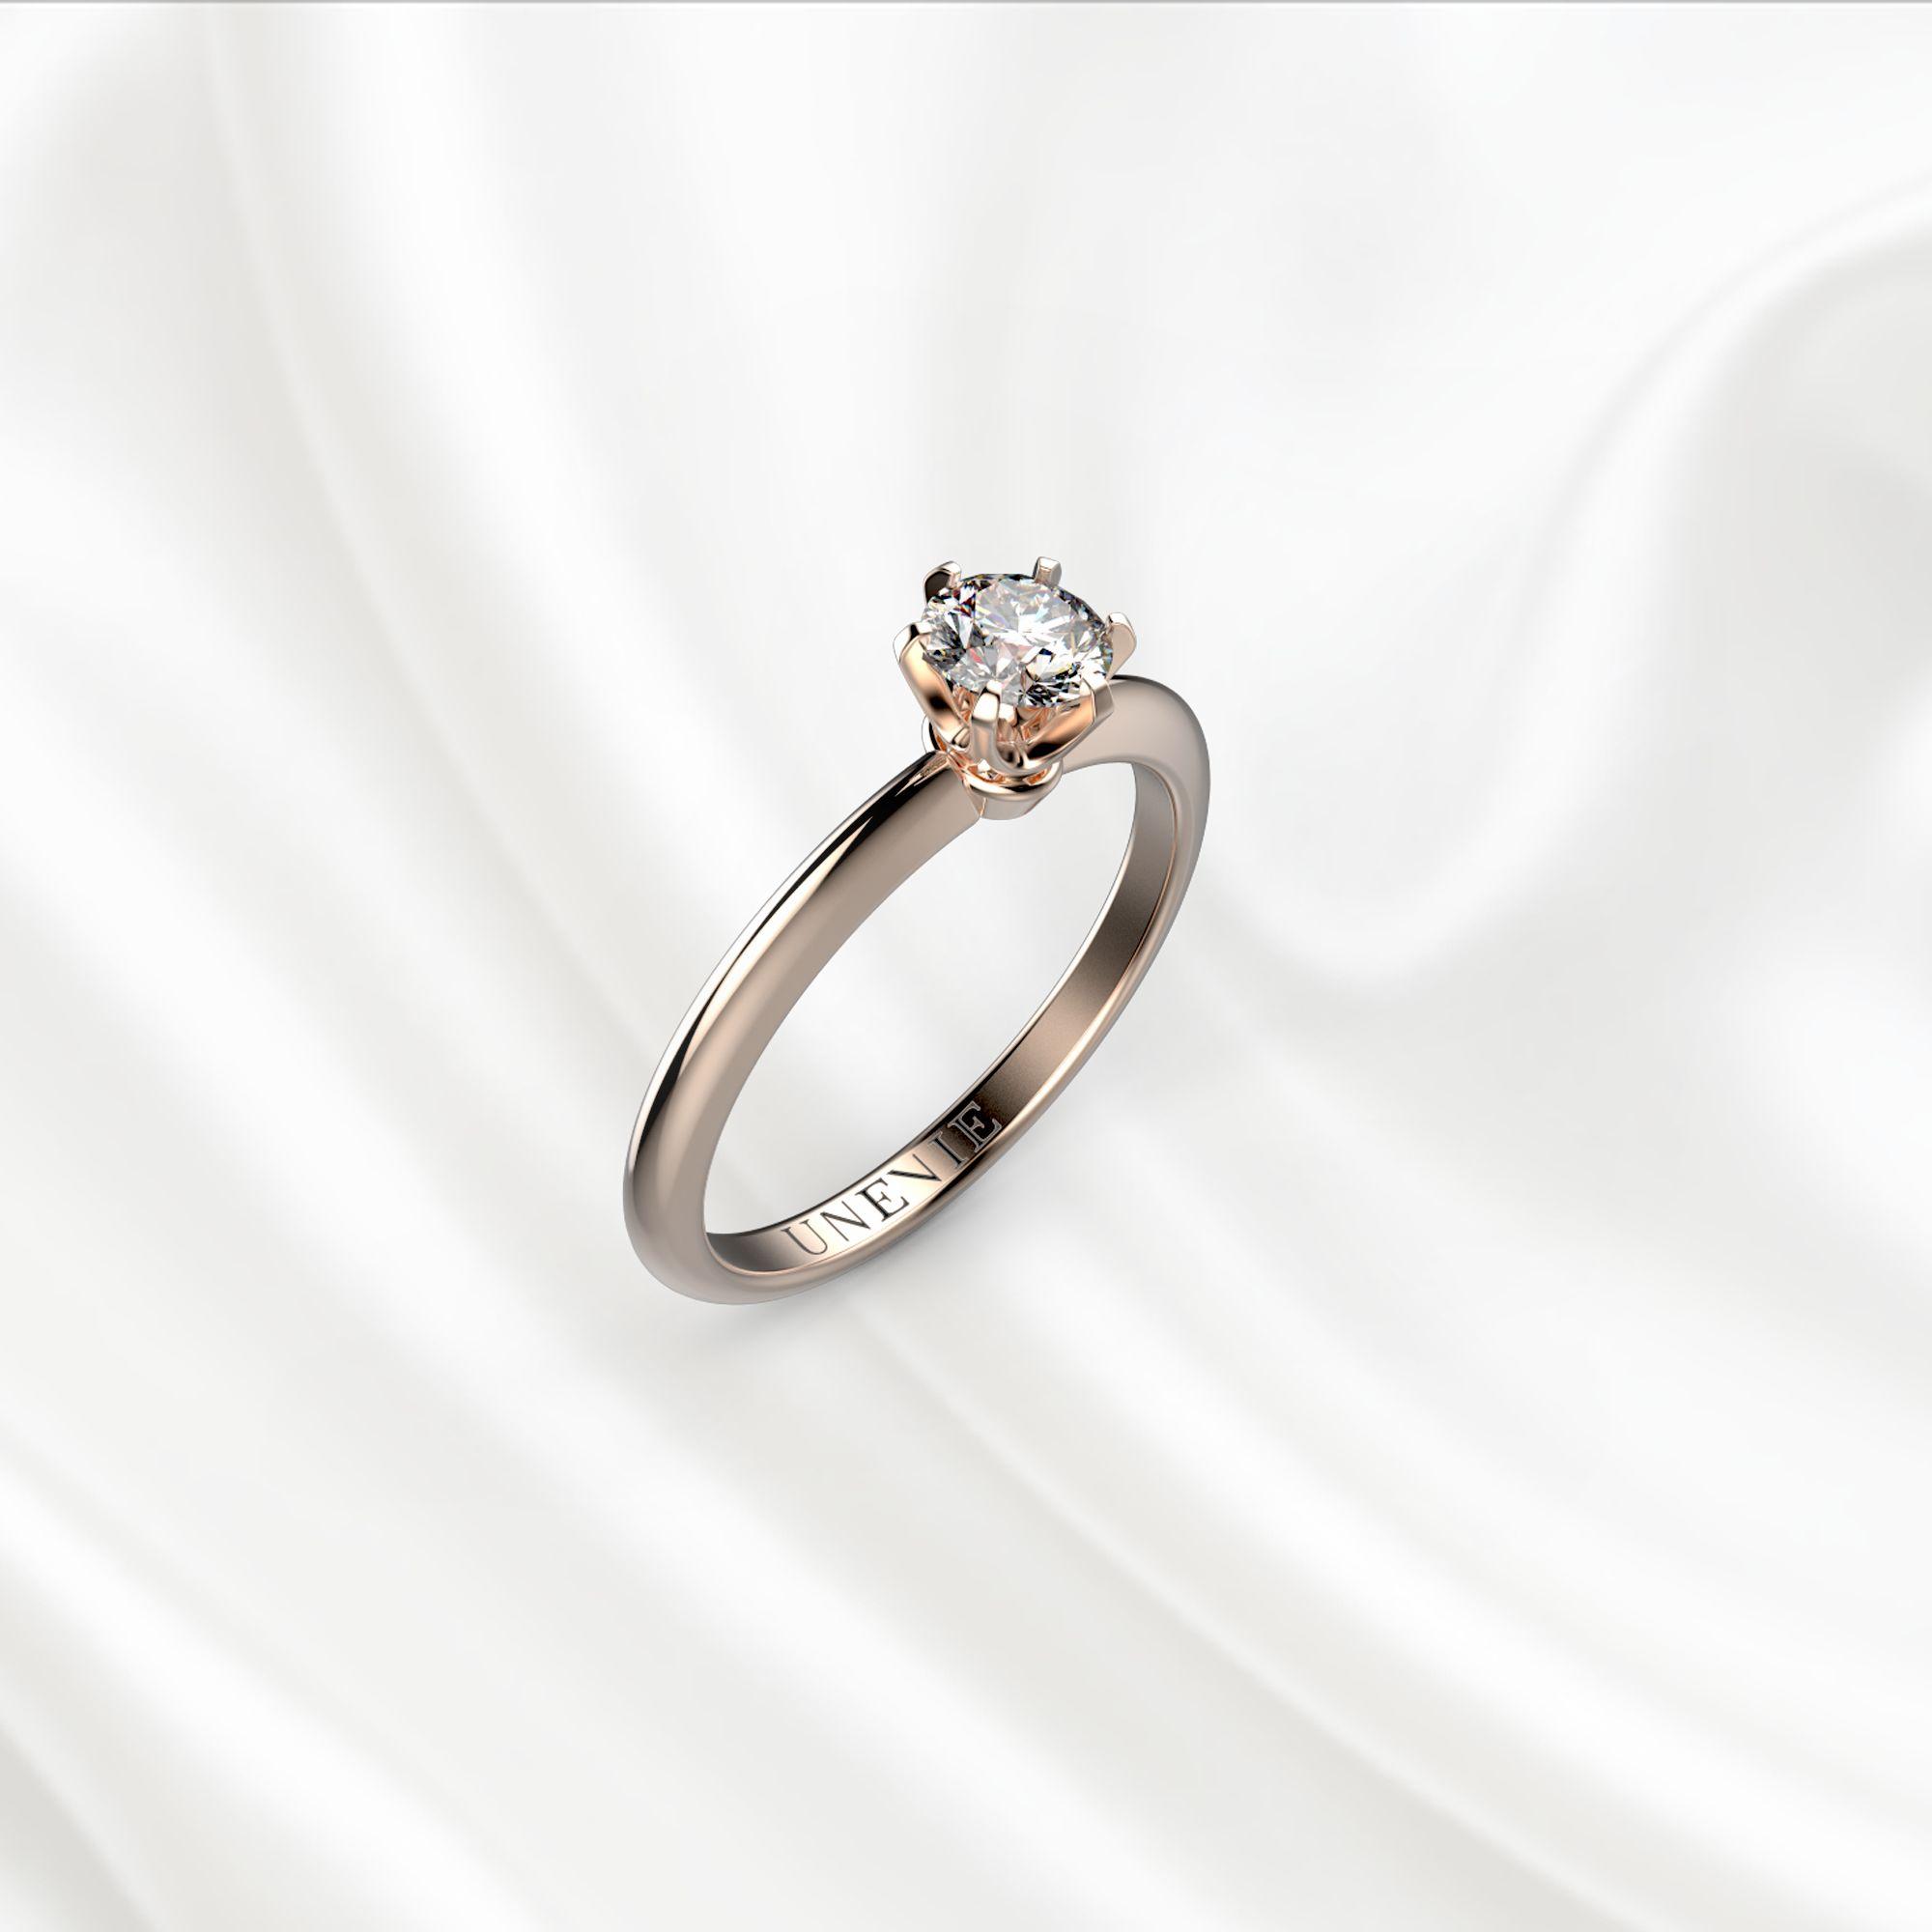 N6-1 Помолвочное кольцо из розового золота с бриллиантом 0.3 карат